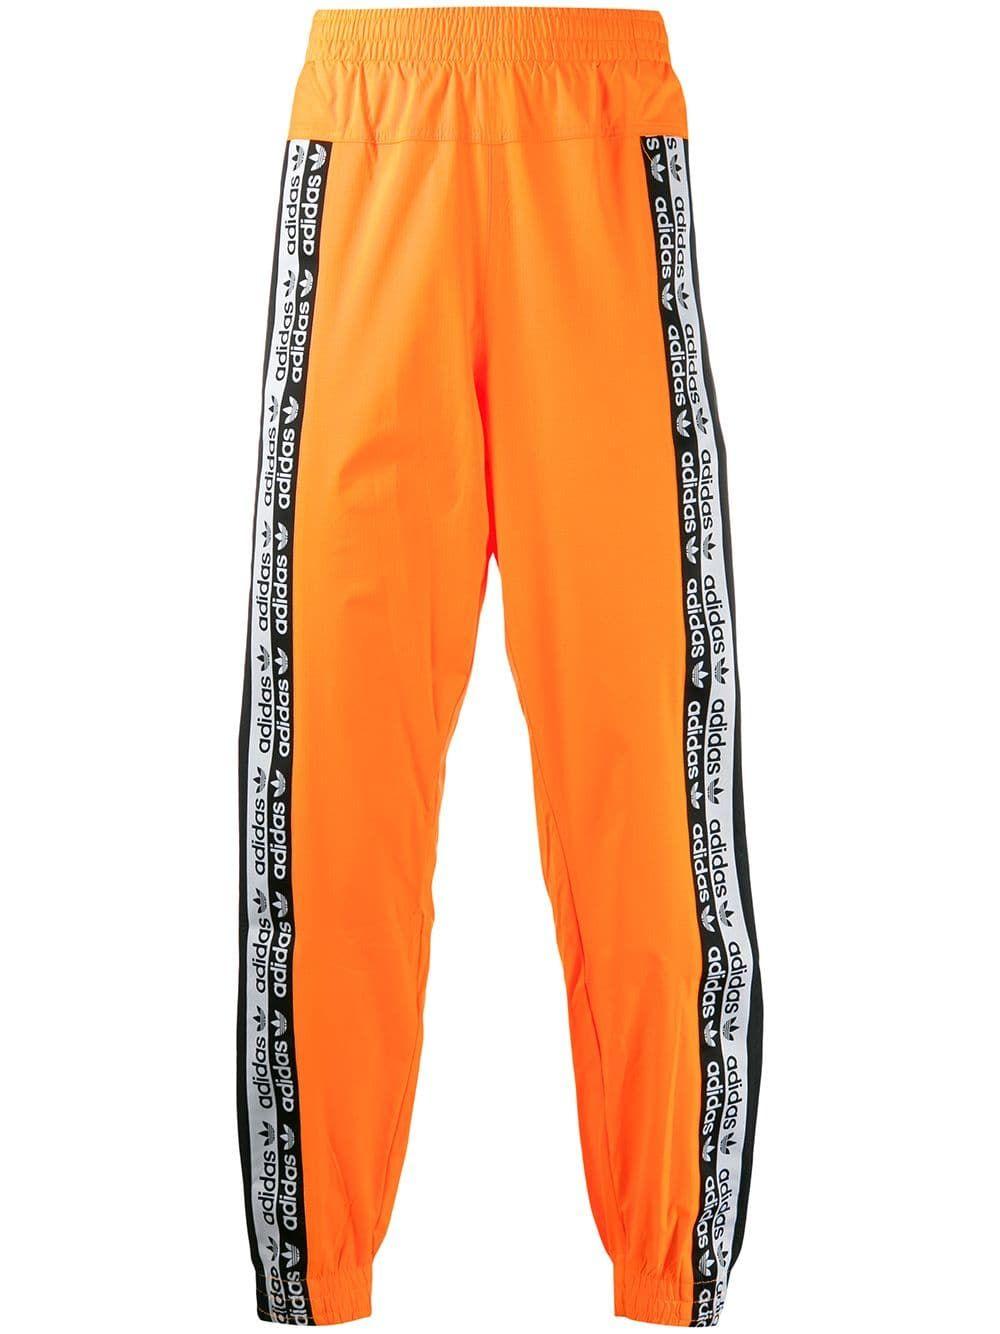 Adidas R.Y.V. Track Pants in 2020 | Sweatpants, Pants